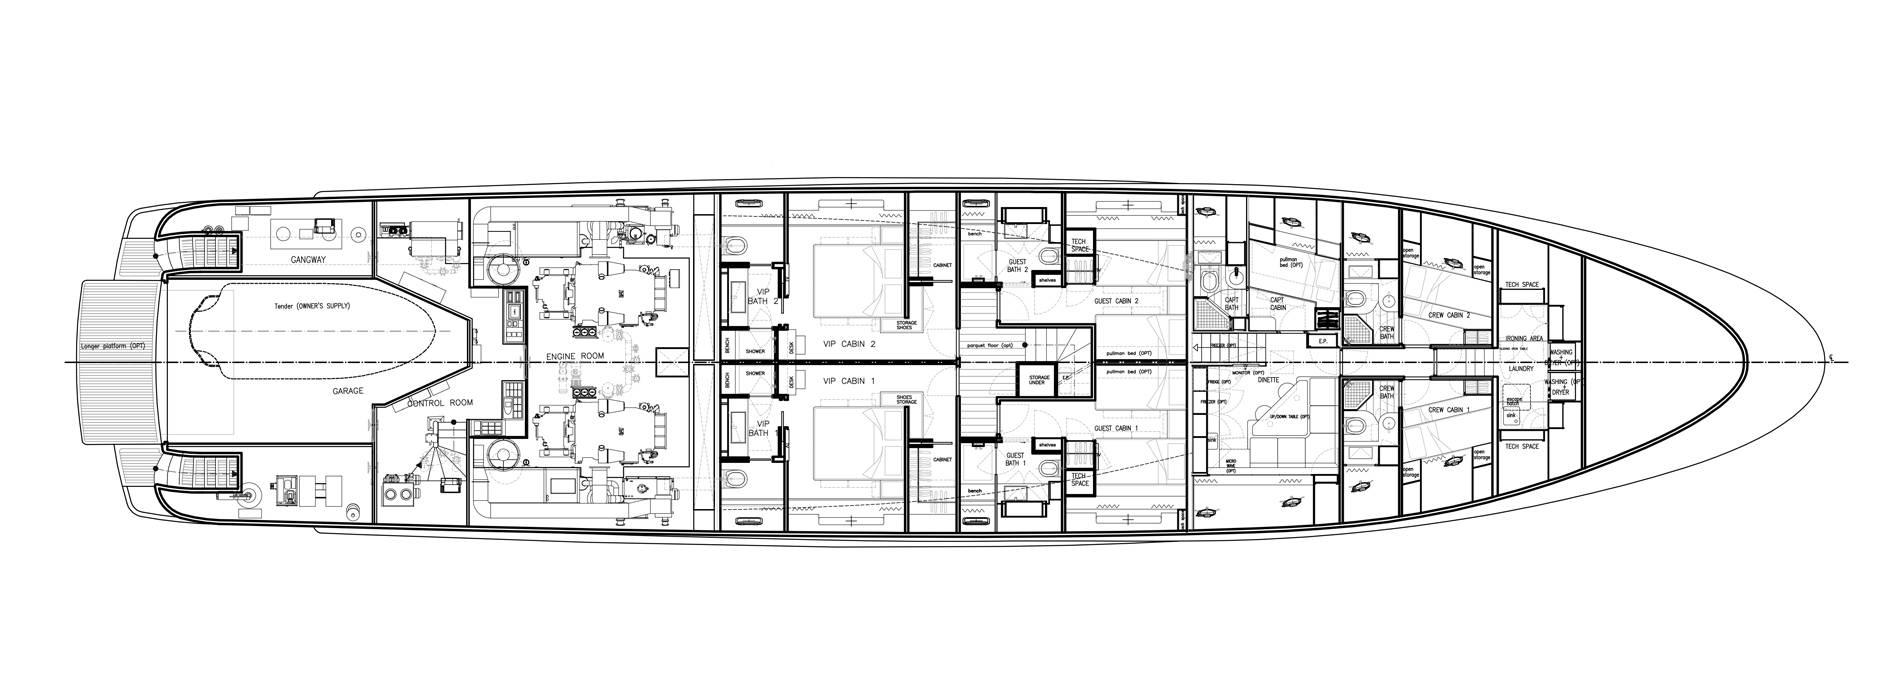 Sanlorenzo Yachts SD122-27 under offer Pont inférieur